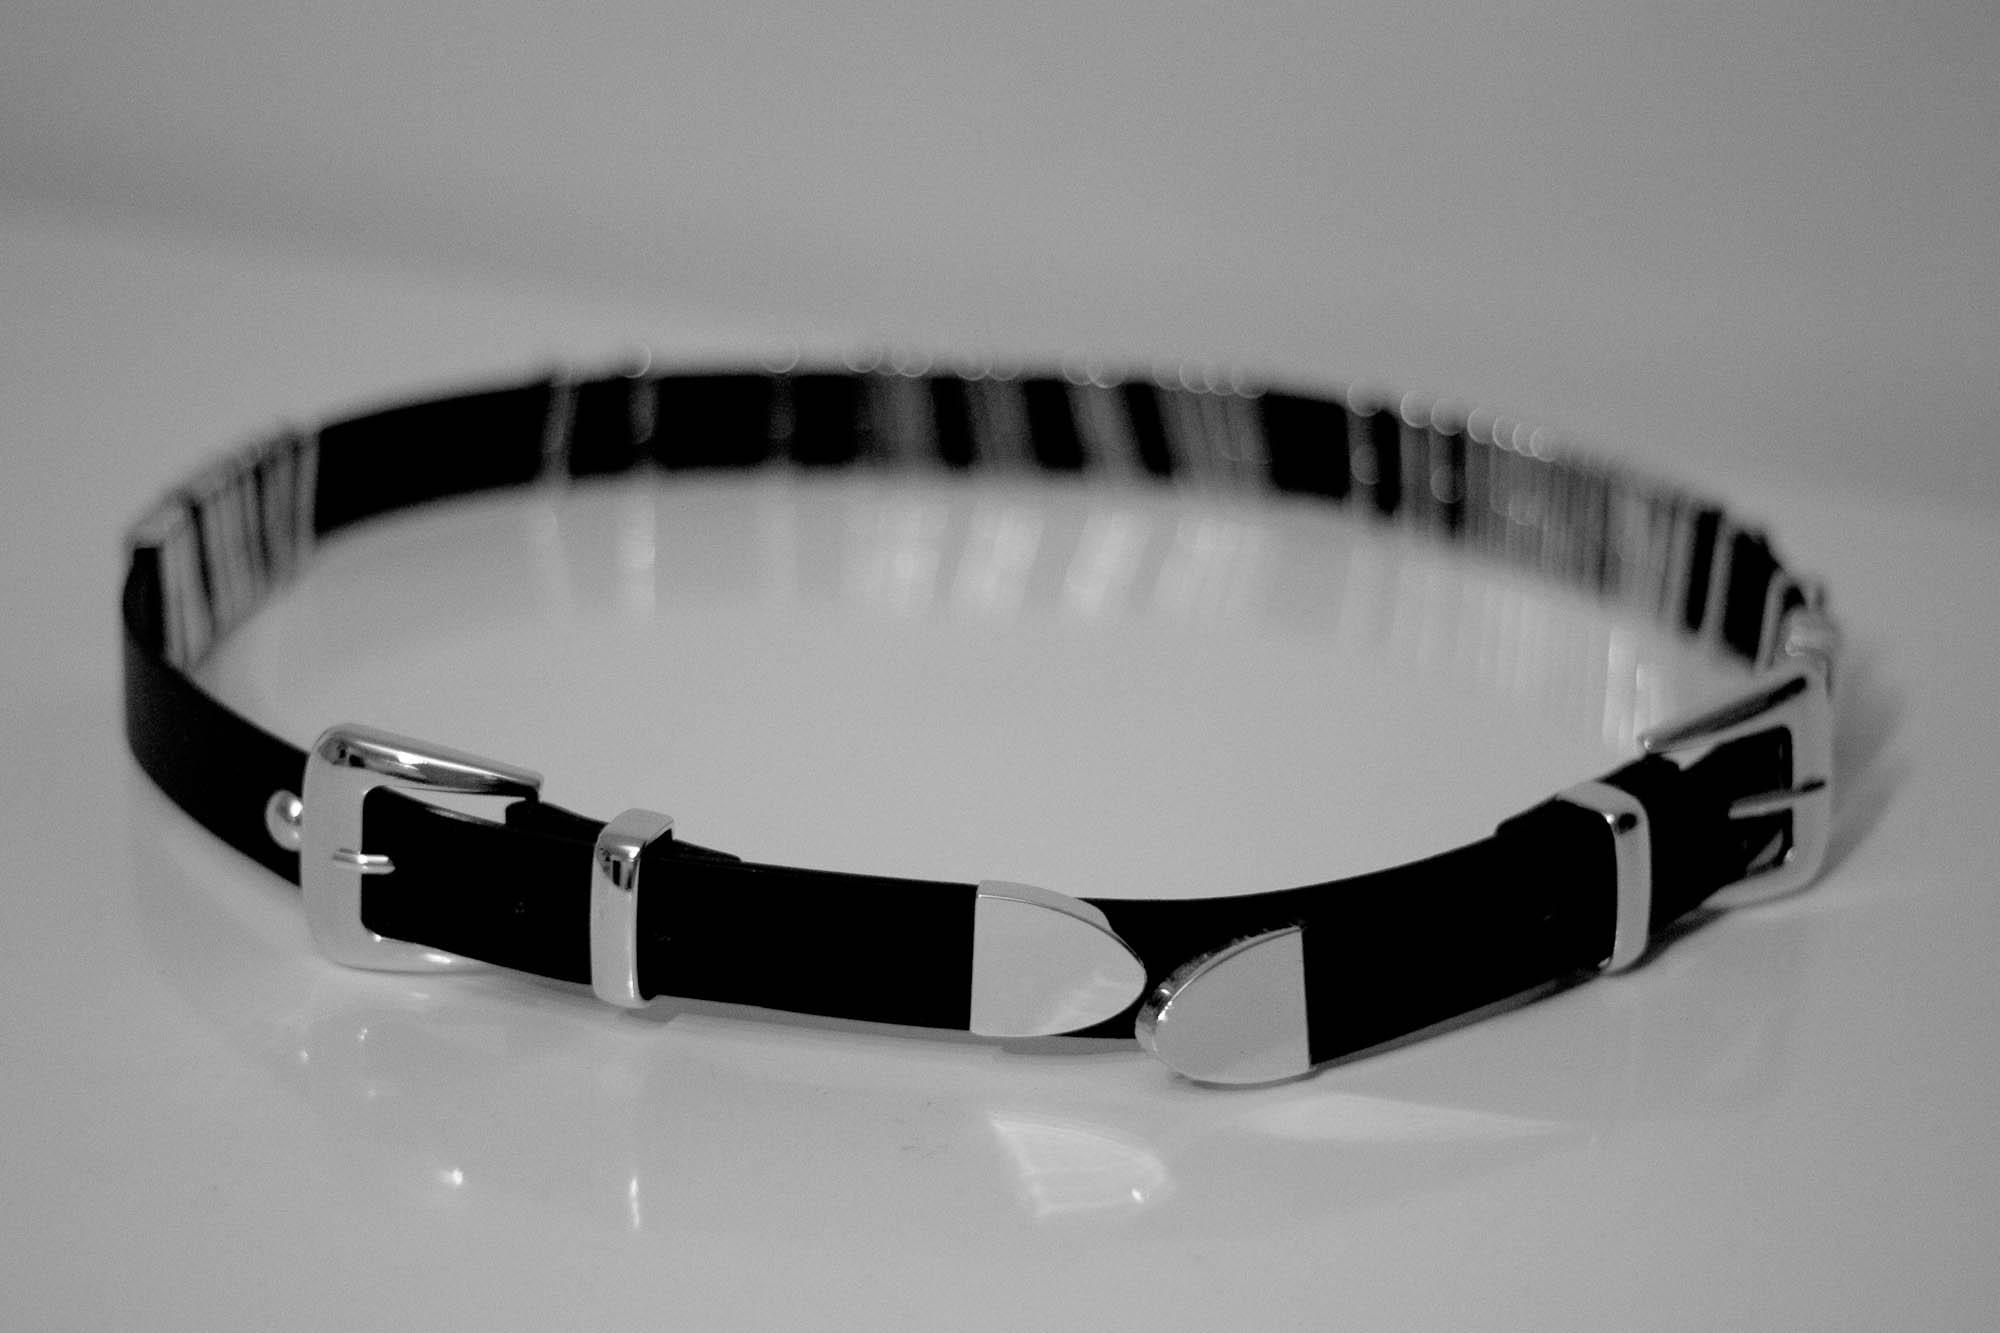 hm belt.jpg